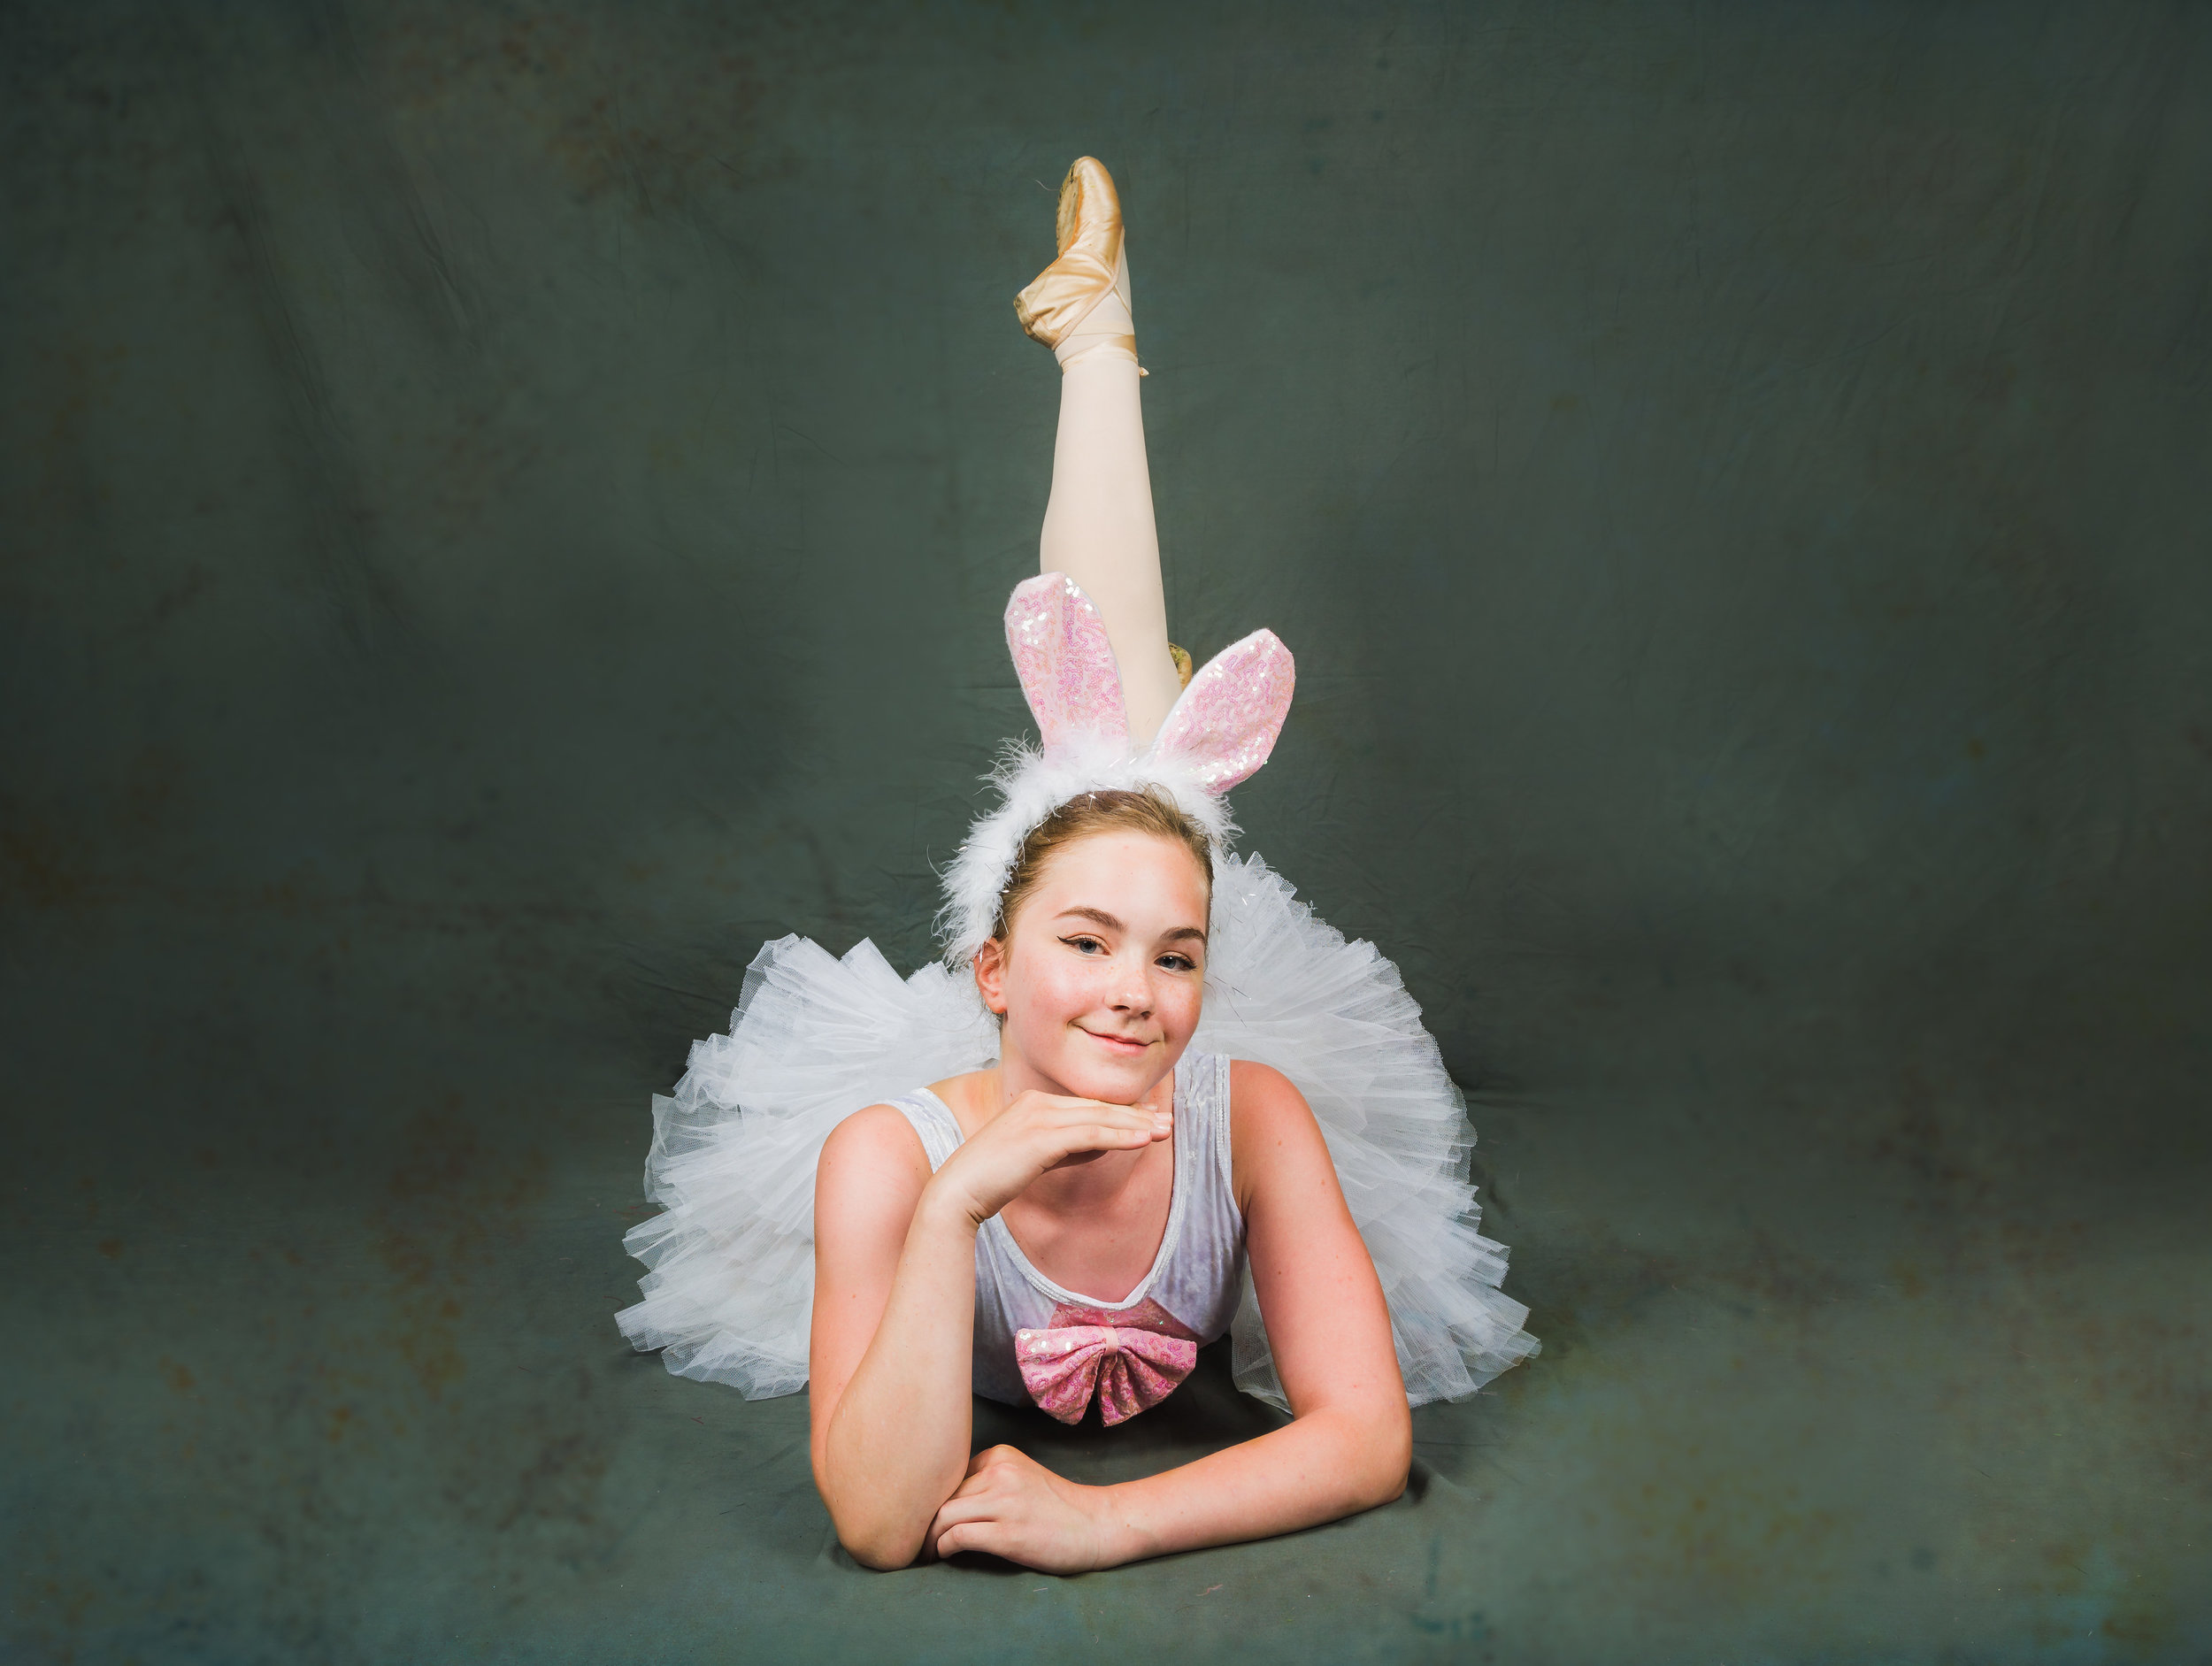 grace-dance-studio-kaiserslautern-einsiedlerhof-gallery-spring-showcase-alice-in-wonderland-1